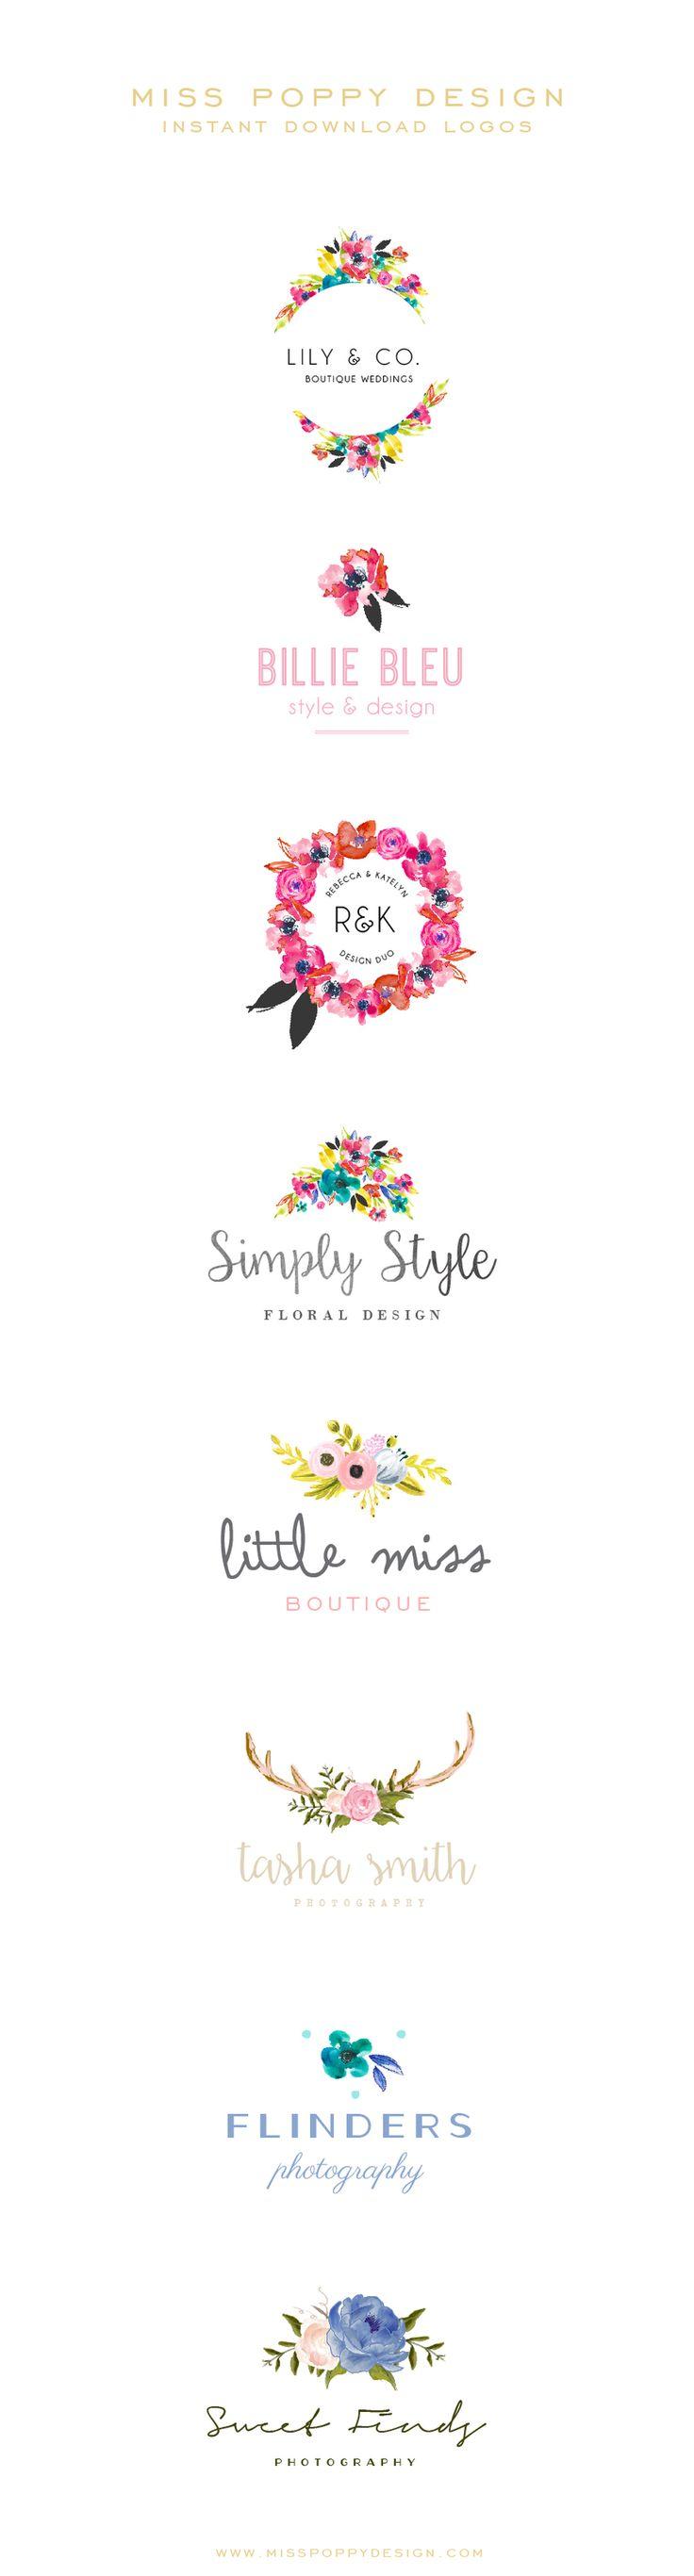 Logo Design / Brand Design / Branding / Photographer / Wedding / Watercolour / Brand Design / Miss Poppy Design